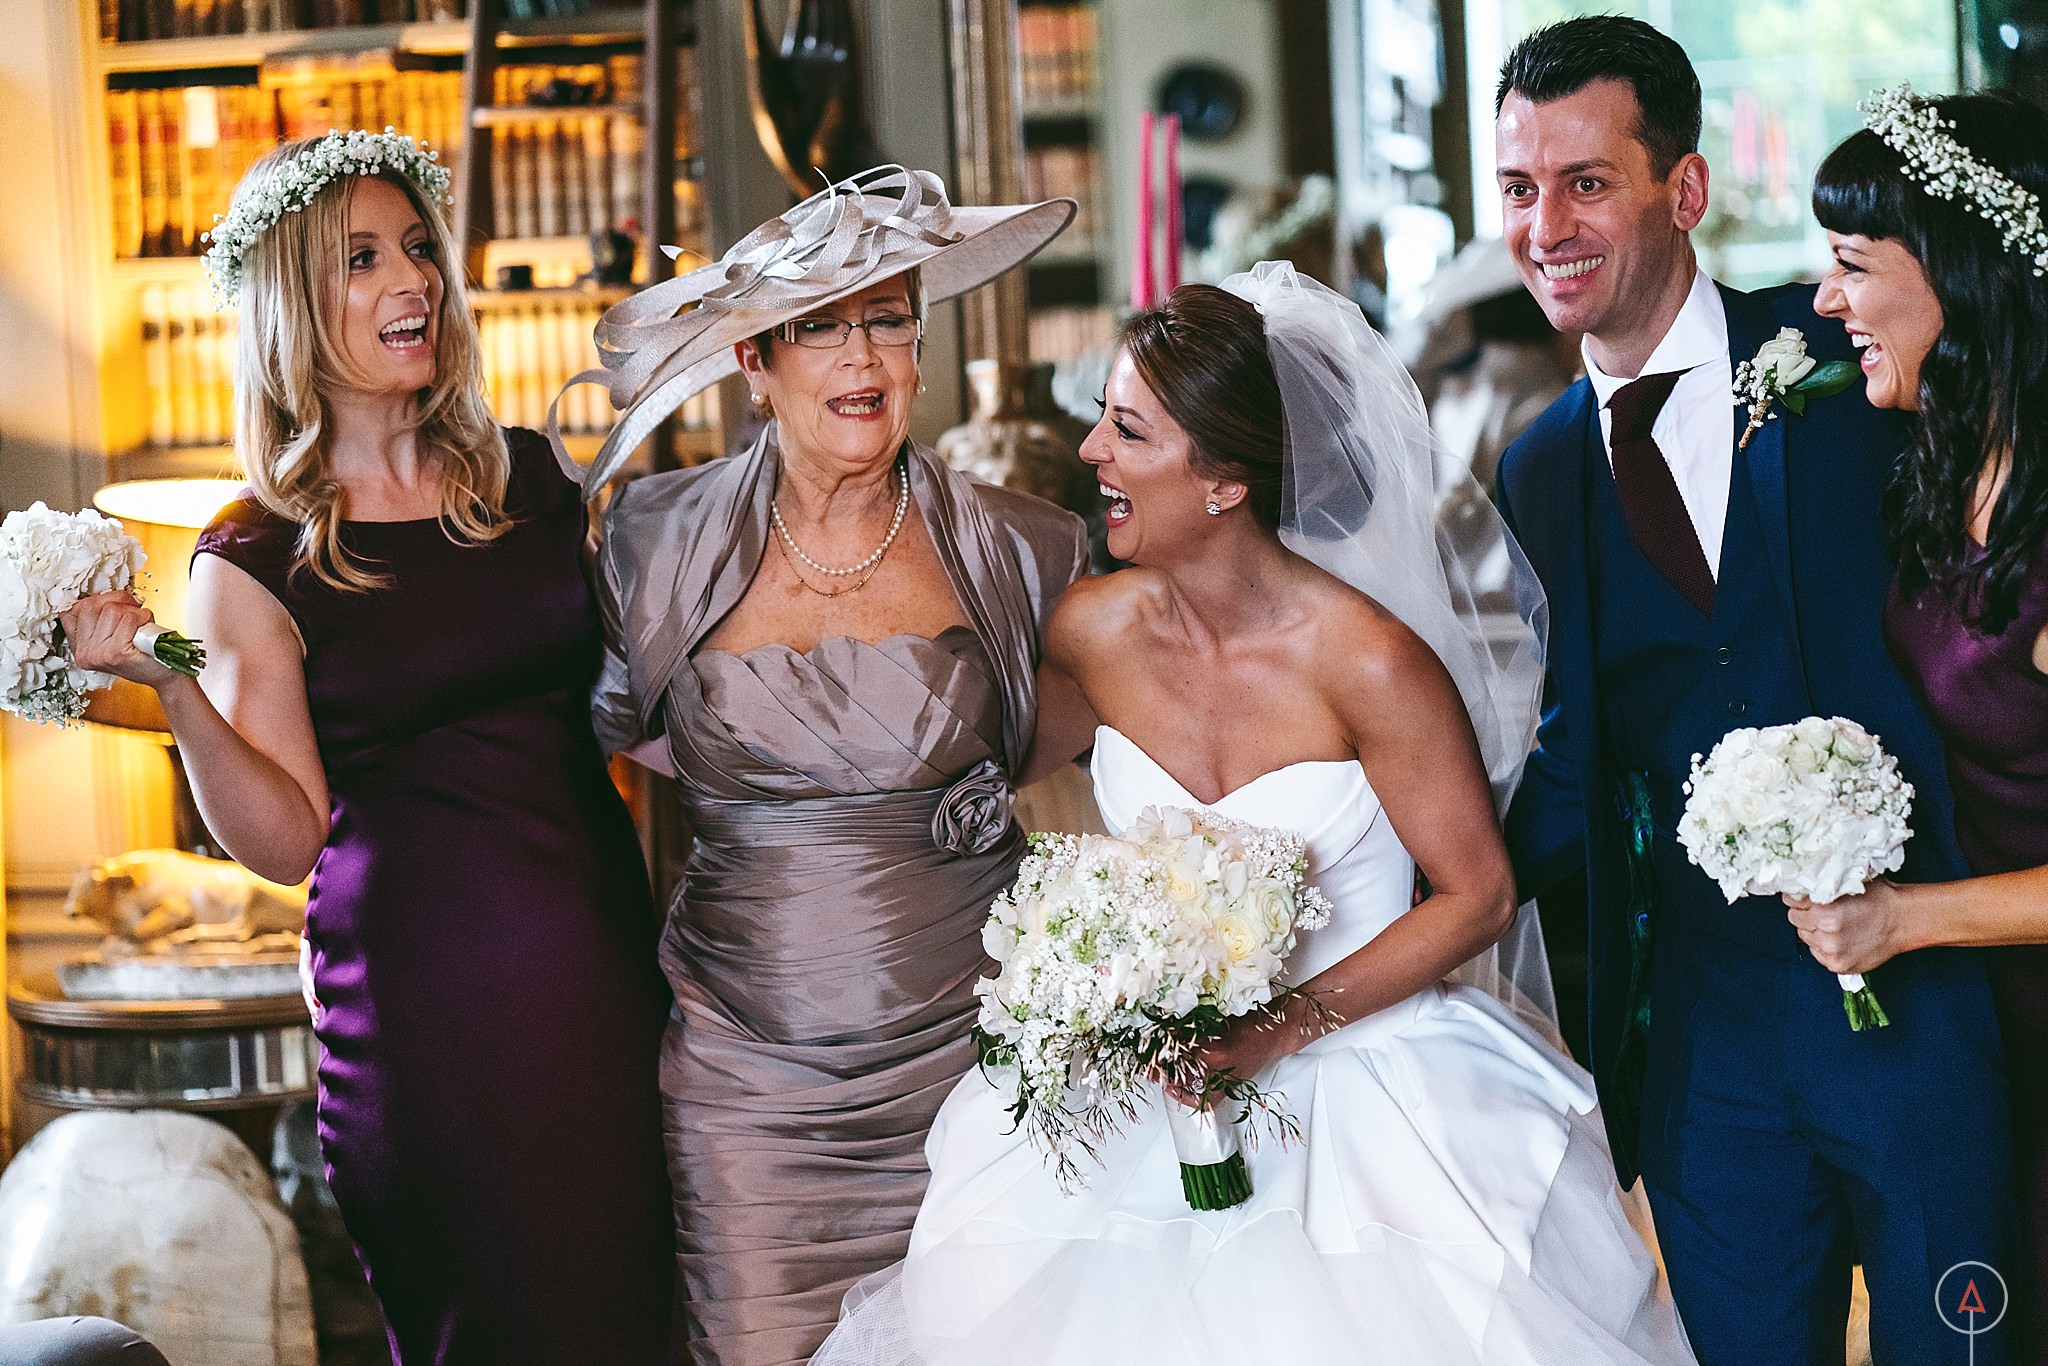 cardiff-wedding-photographer-aga-tomaszek_0282